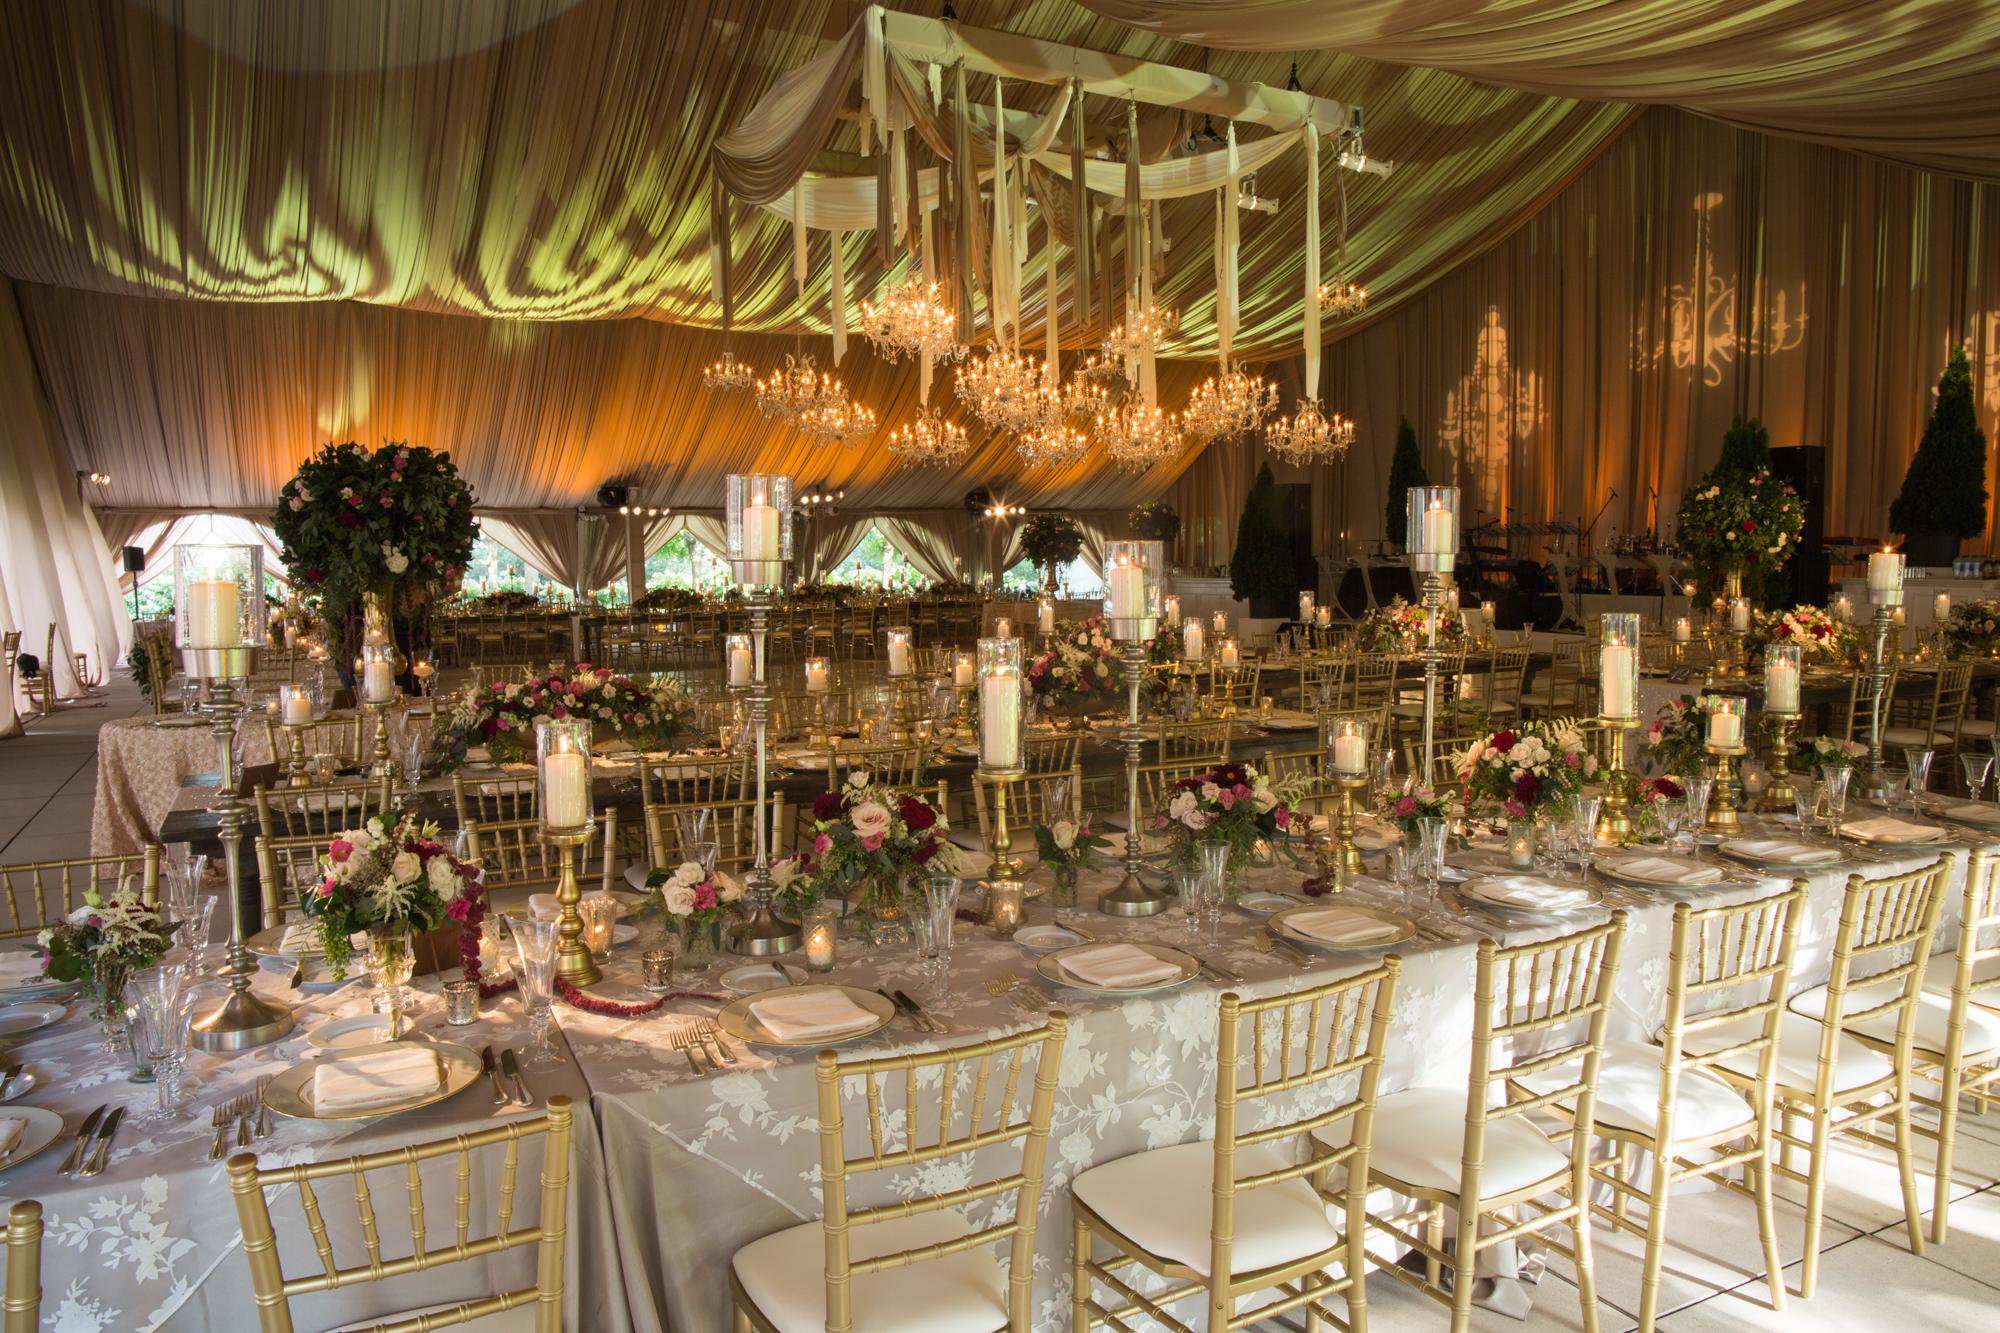 Reception Set for Millennium Park Harris Theater Rooftop Wedding in Chicago